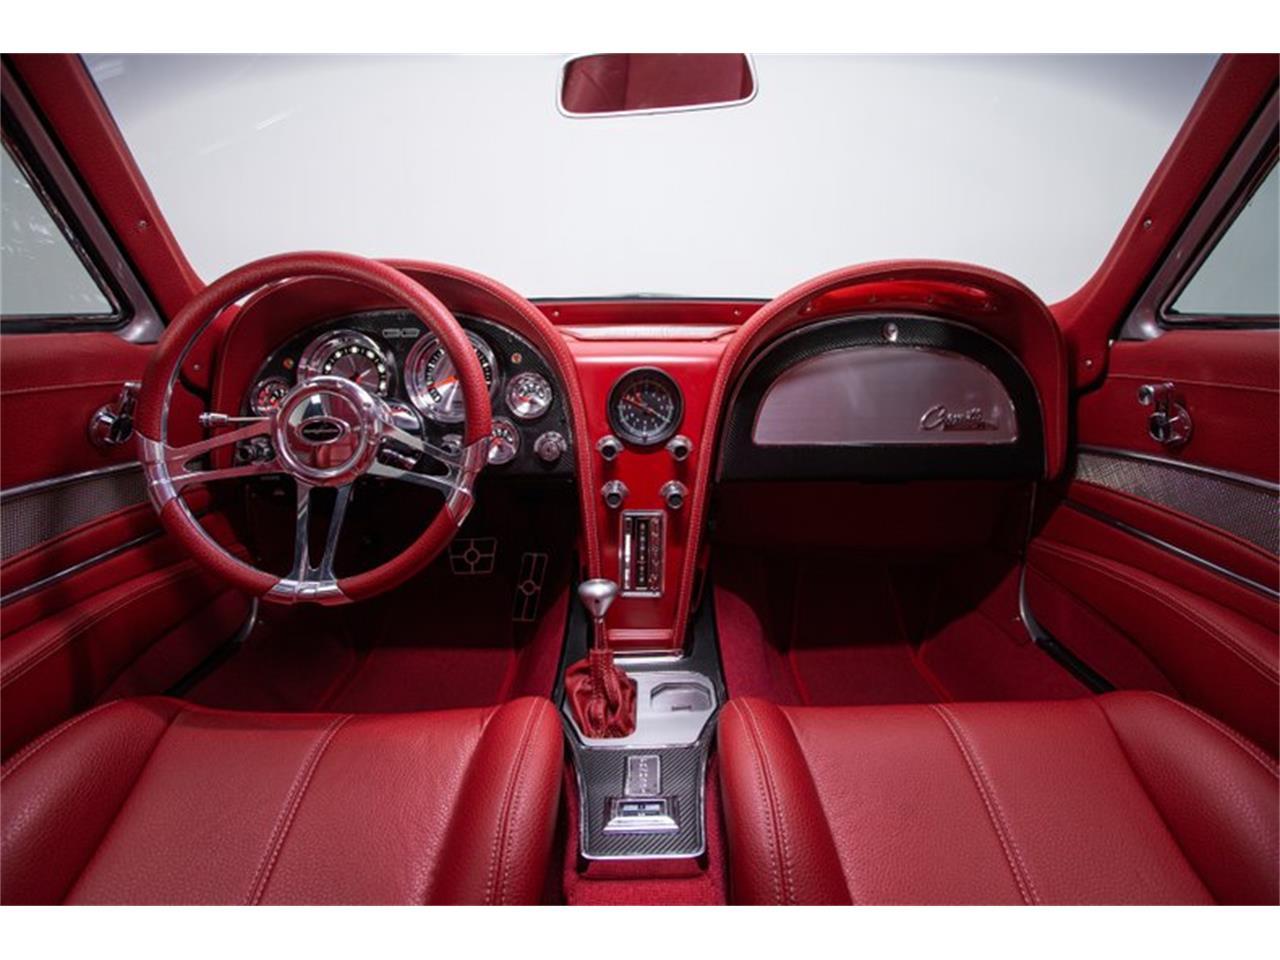 Large Picture of '67 Chevrolet Corvette located in North Carolina - $189,900.00 - Q4OM